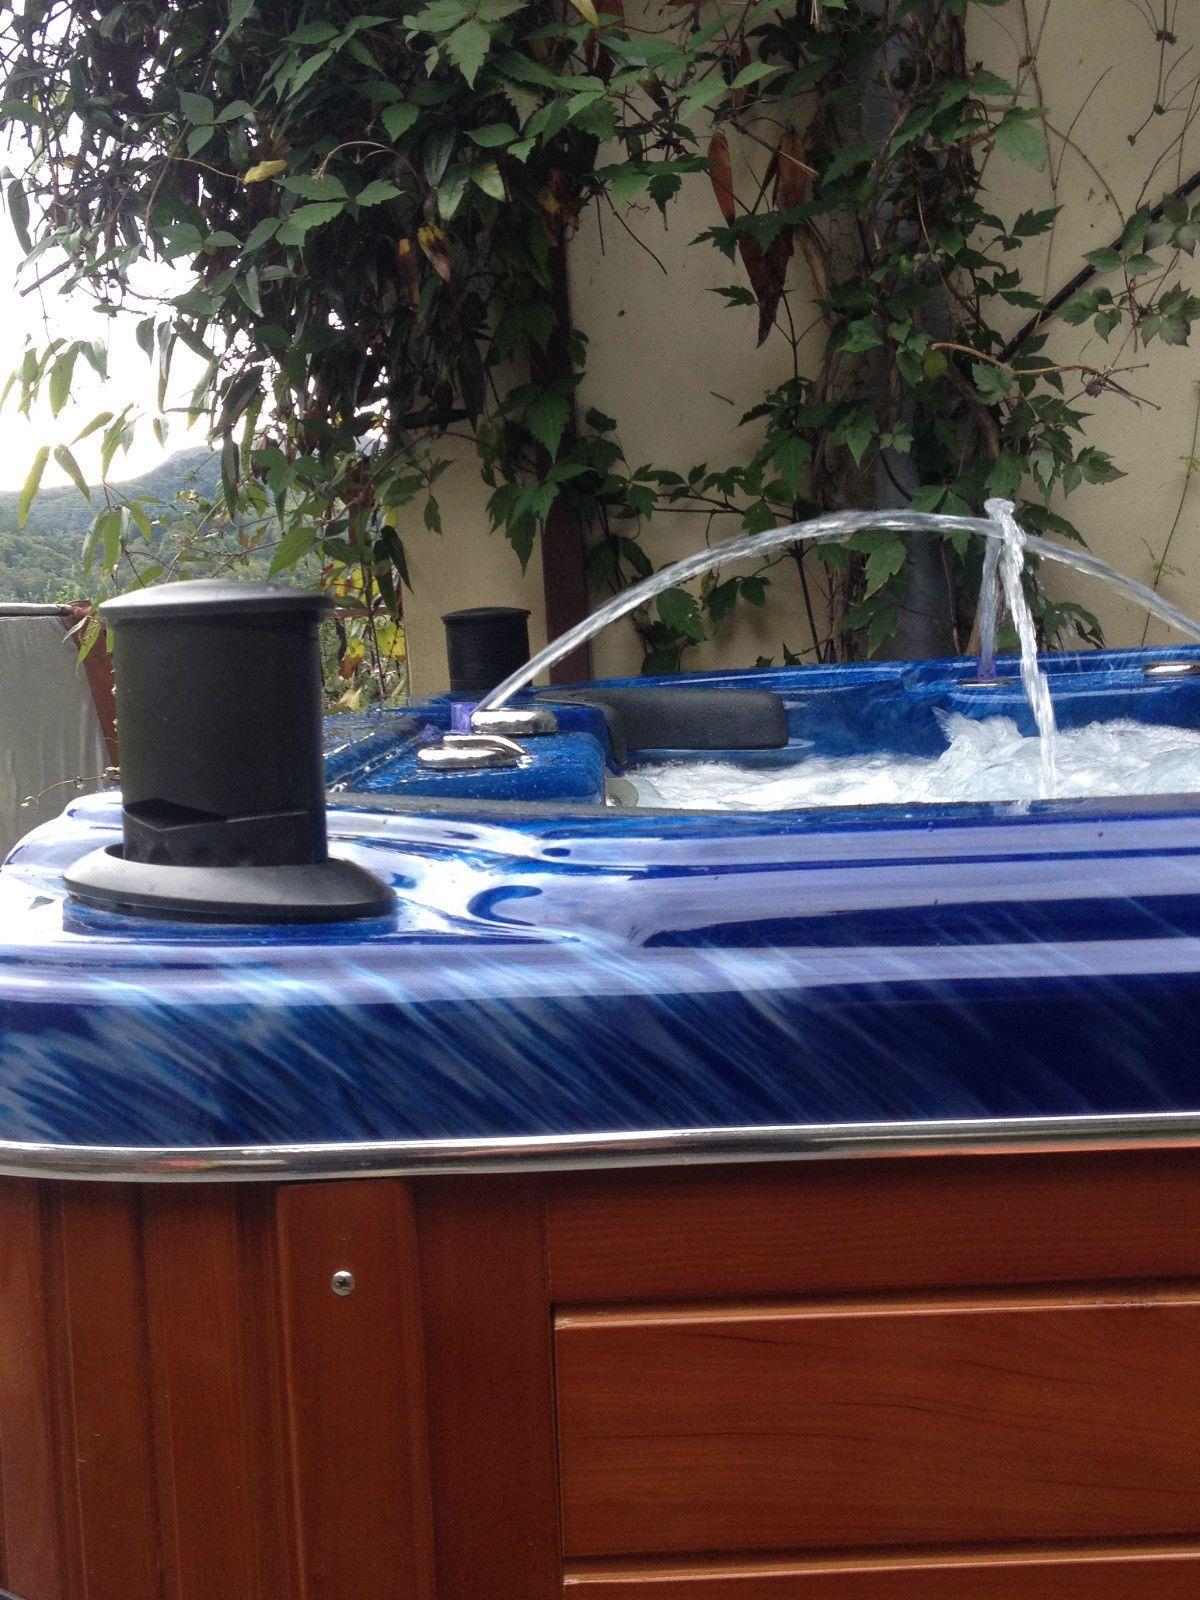 Hot Tubs Hot Tub Spa - BRAND NEW 2015 design USA AMERICANO ACRYLIC